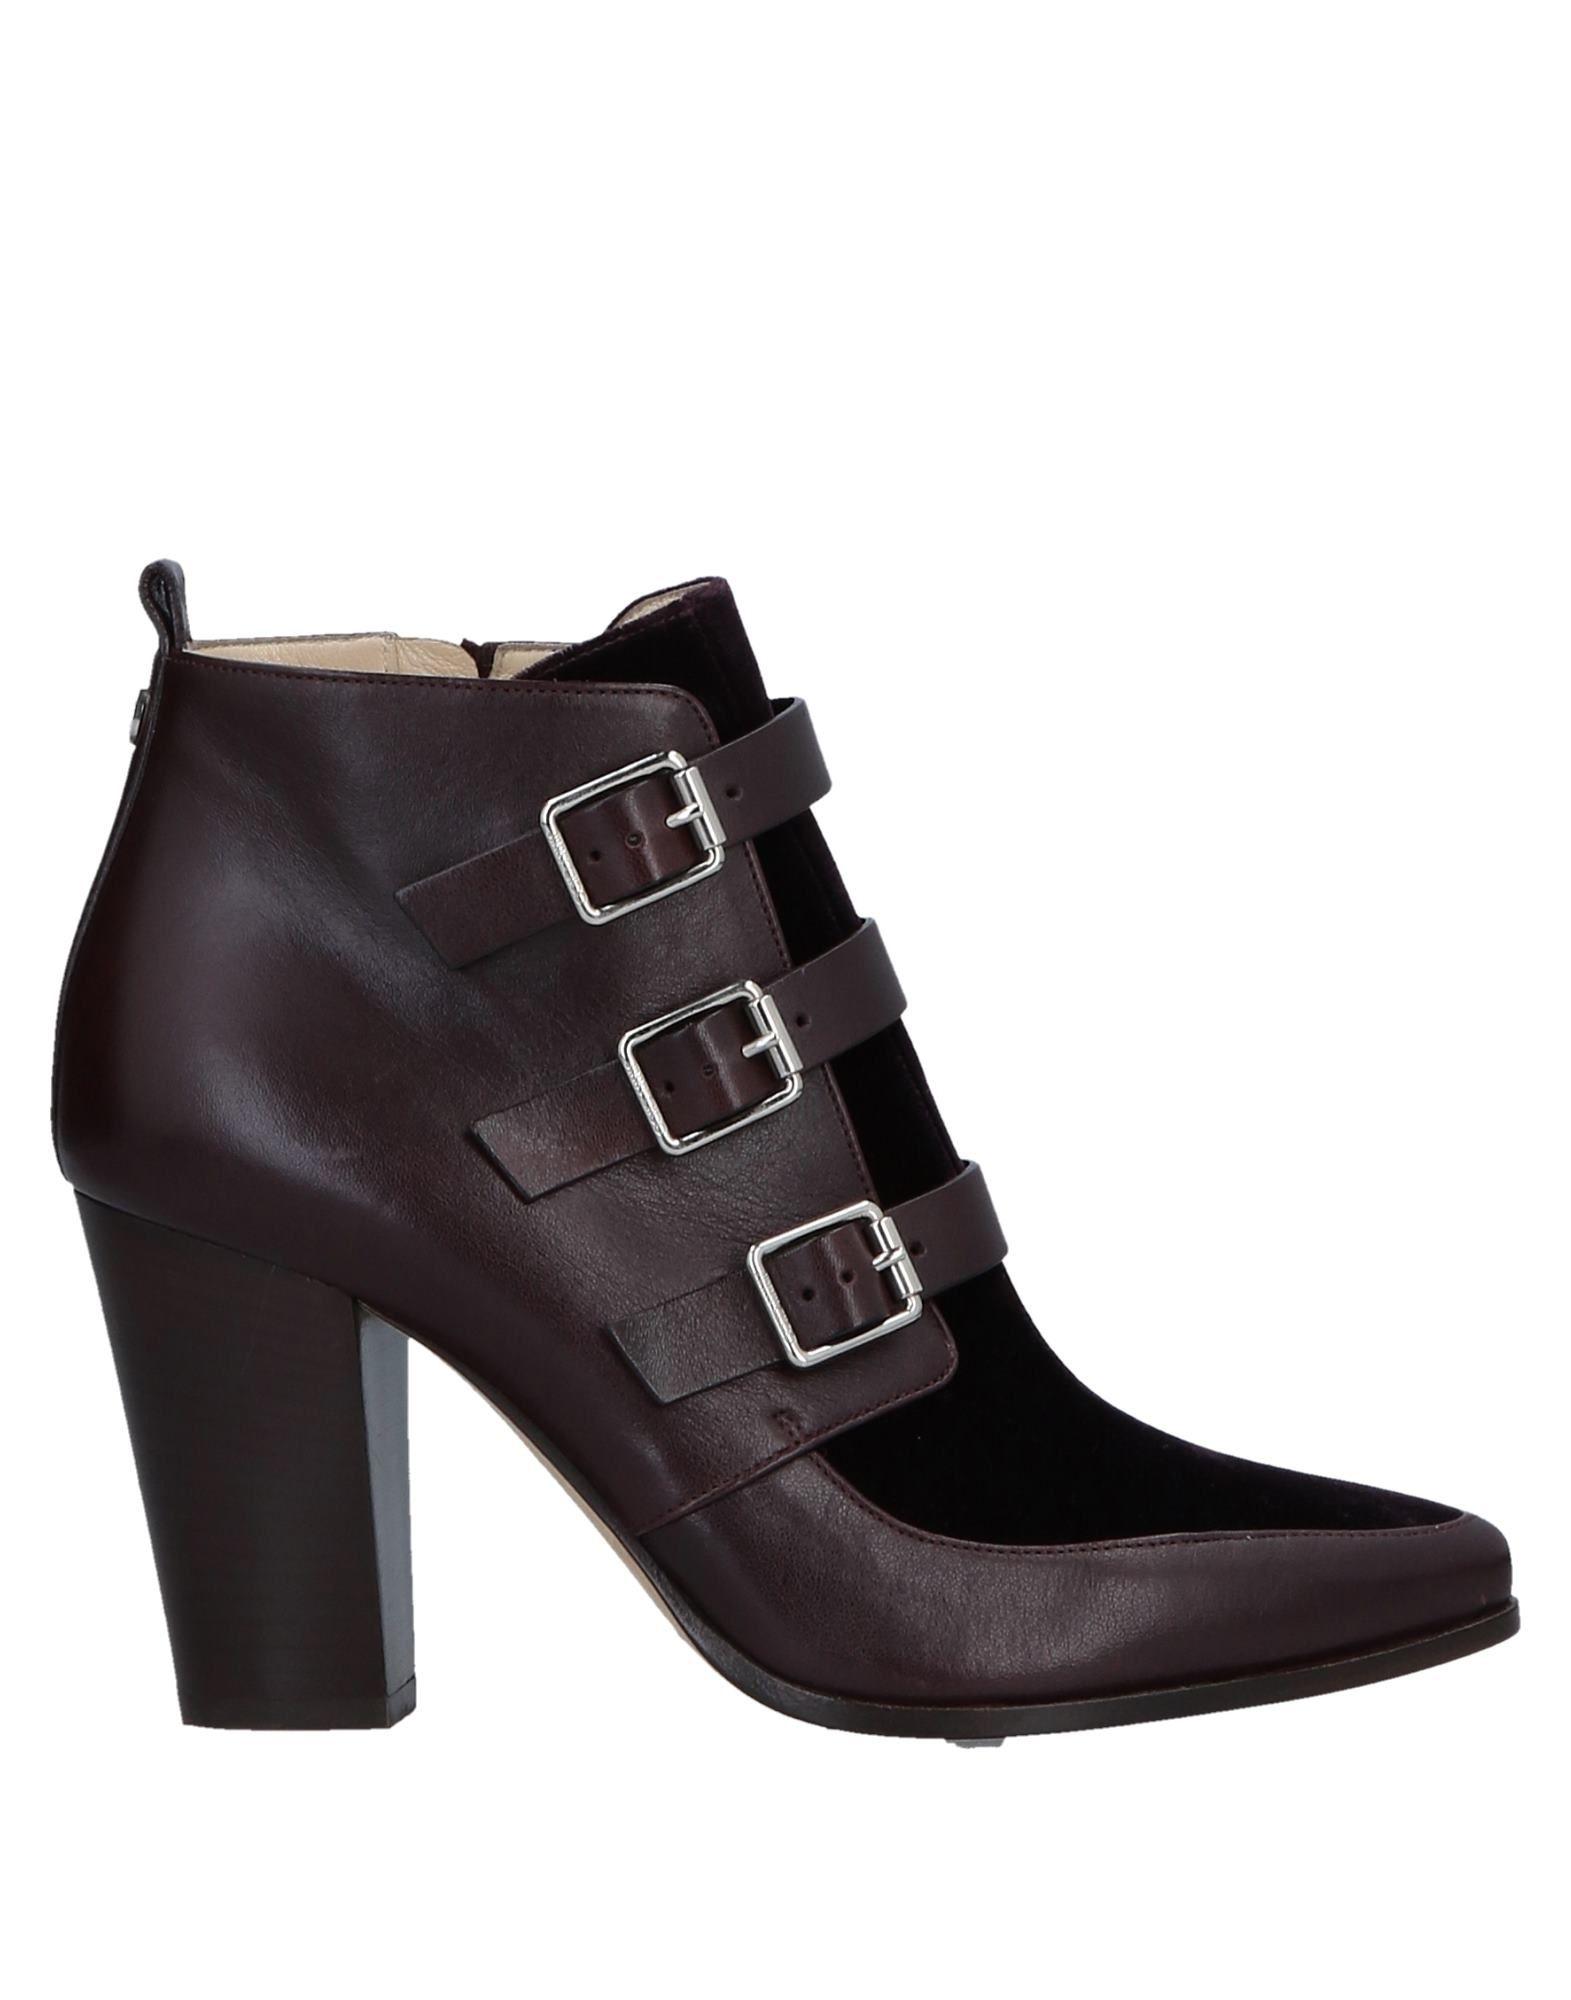 Jimmy Choo Stiefelette Damen  11523500KJGünstige gut aussehende Schuhe